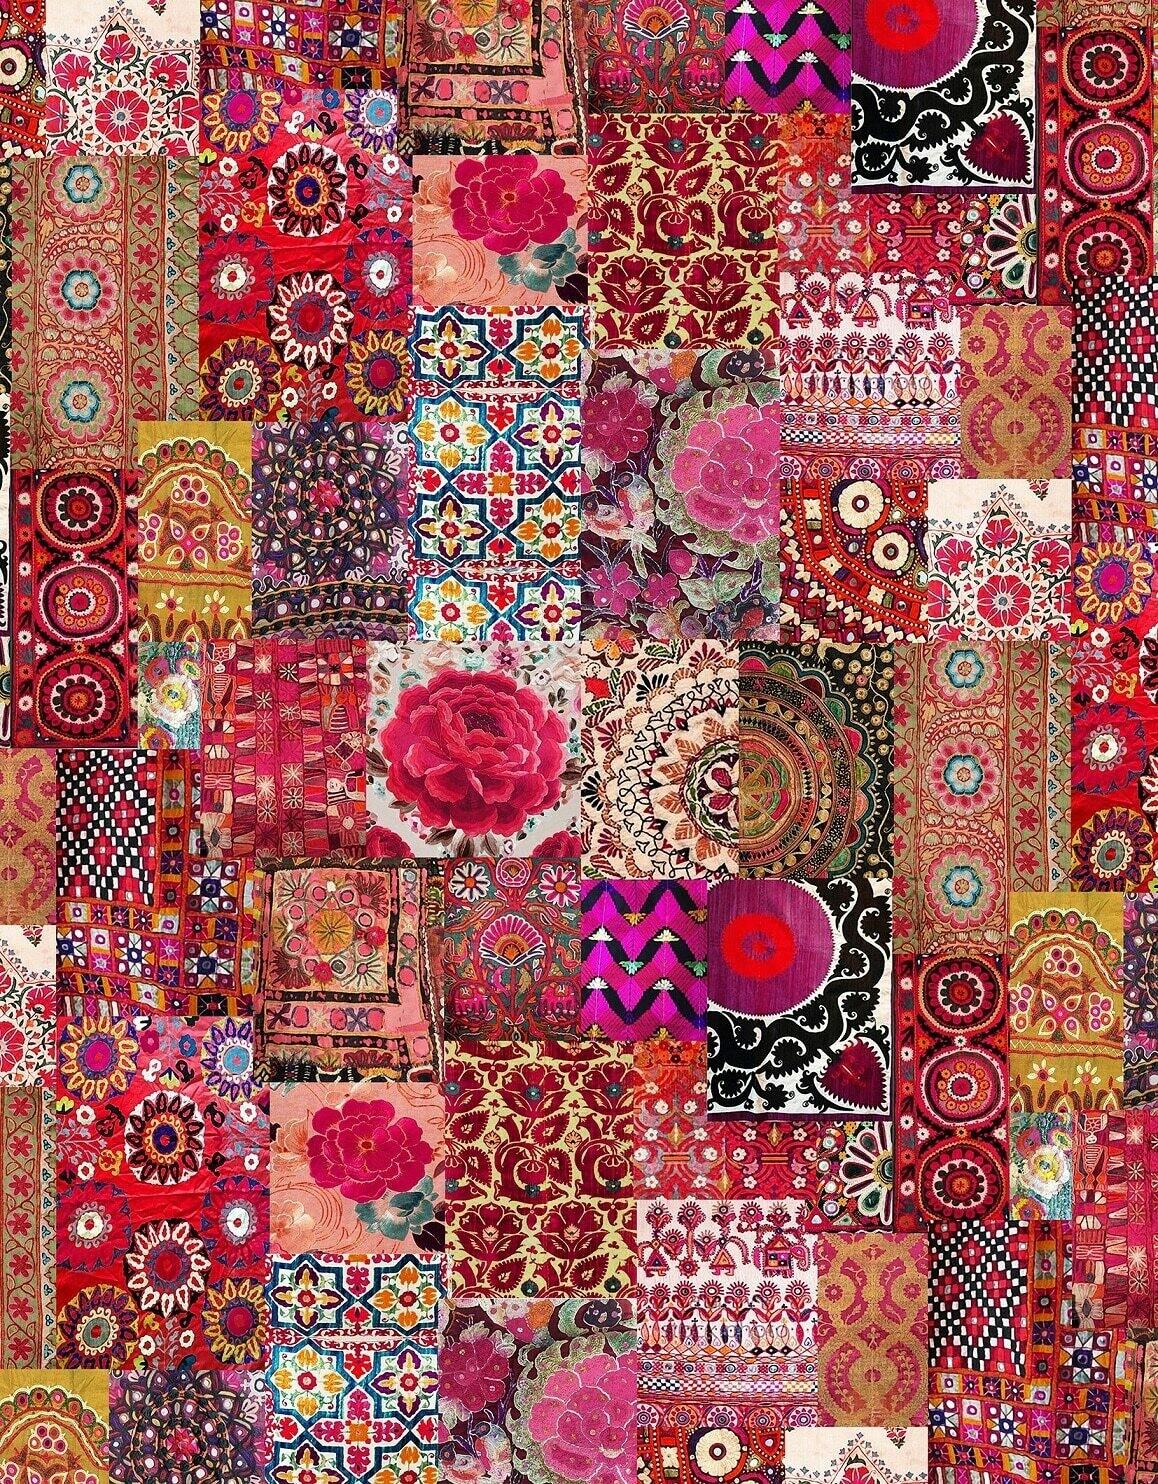 Velvet Throw Pink Embroidery